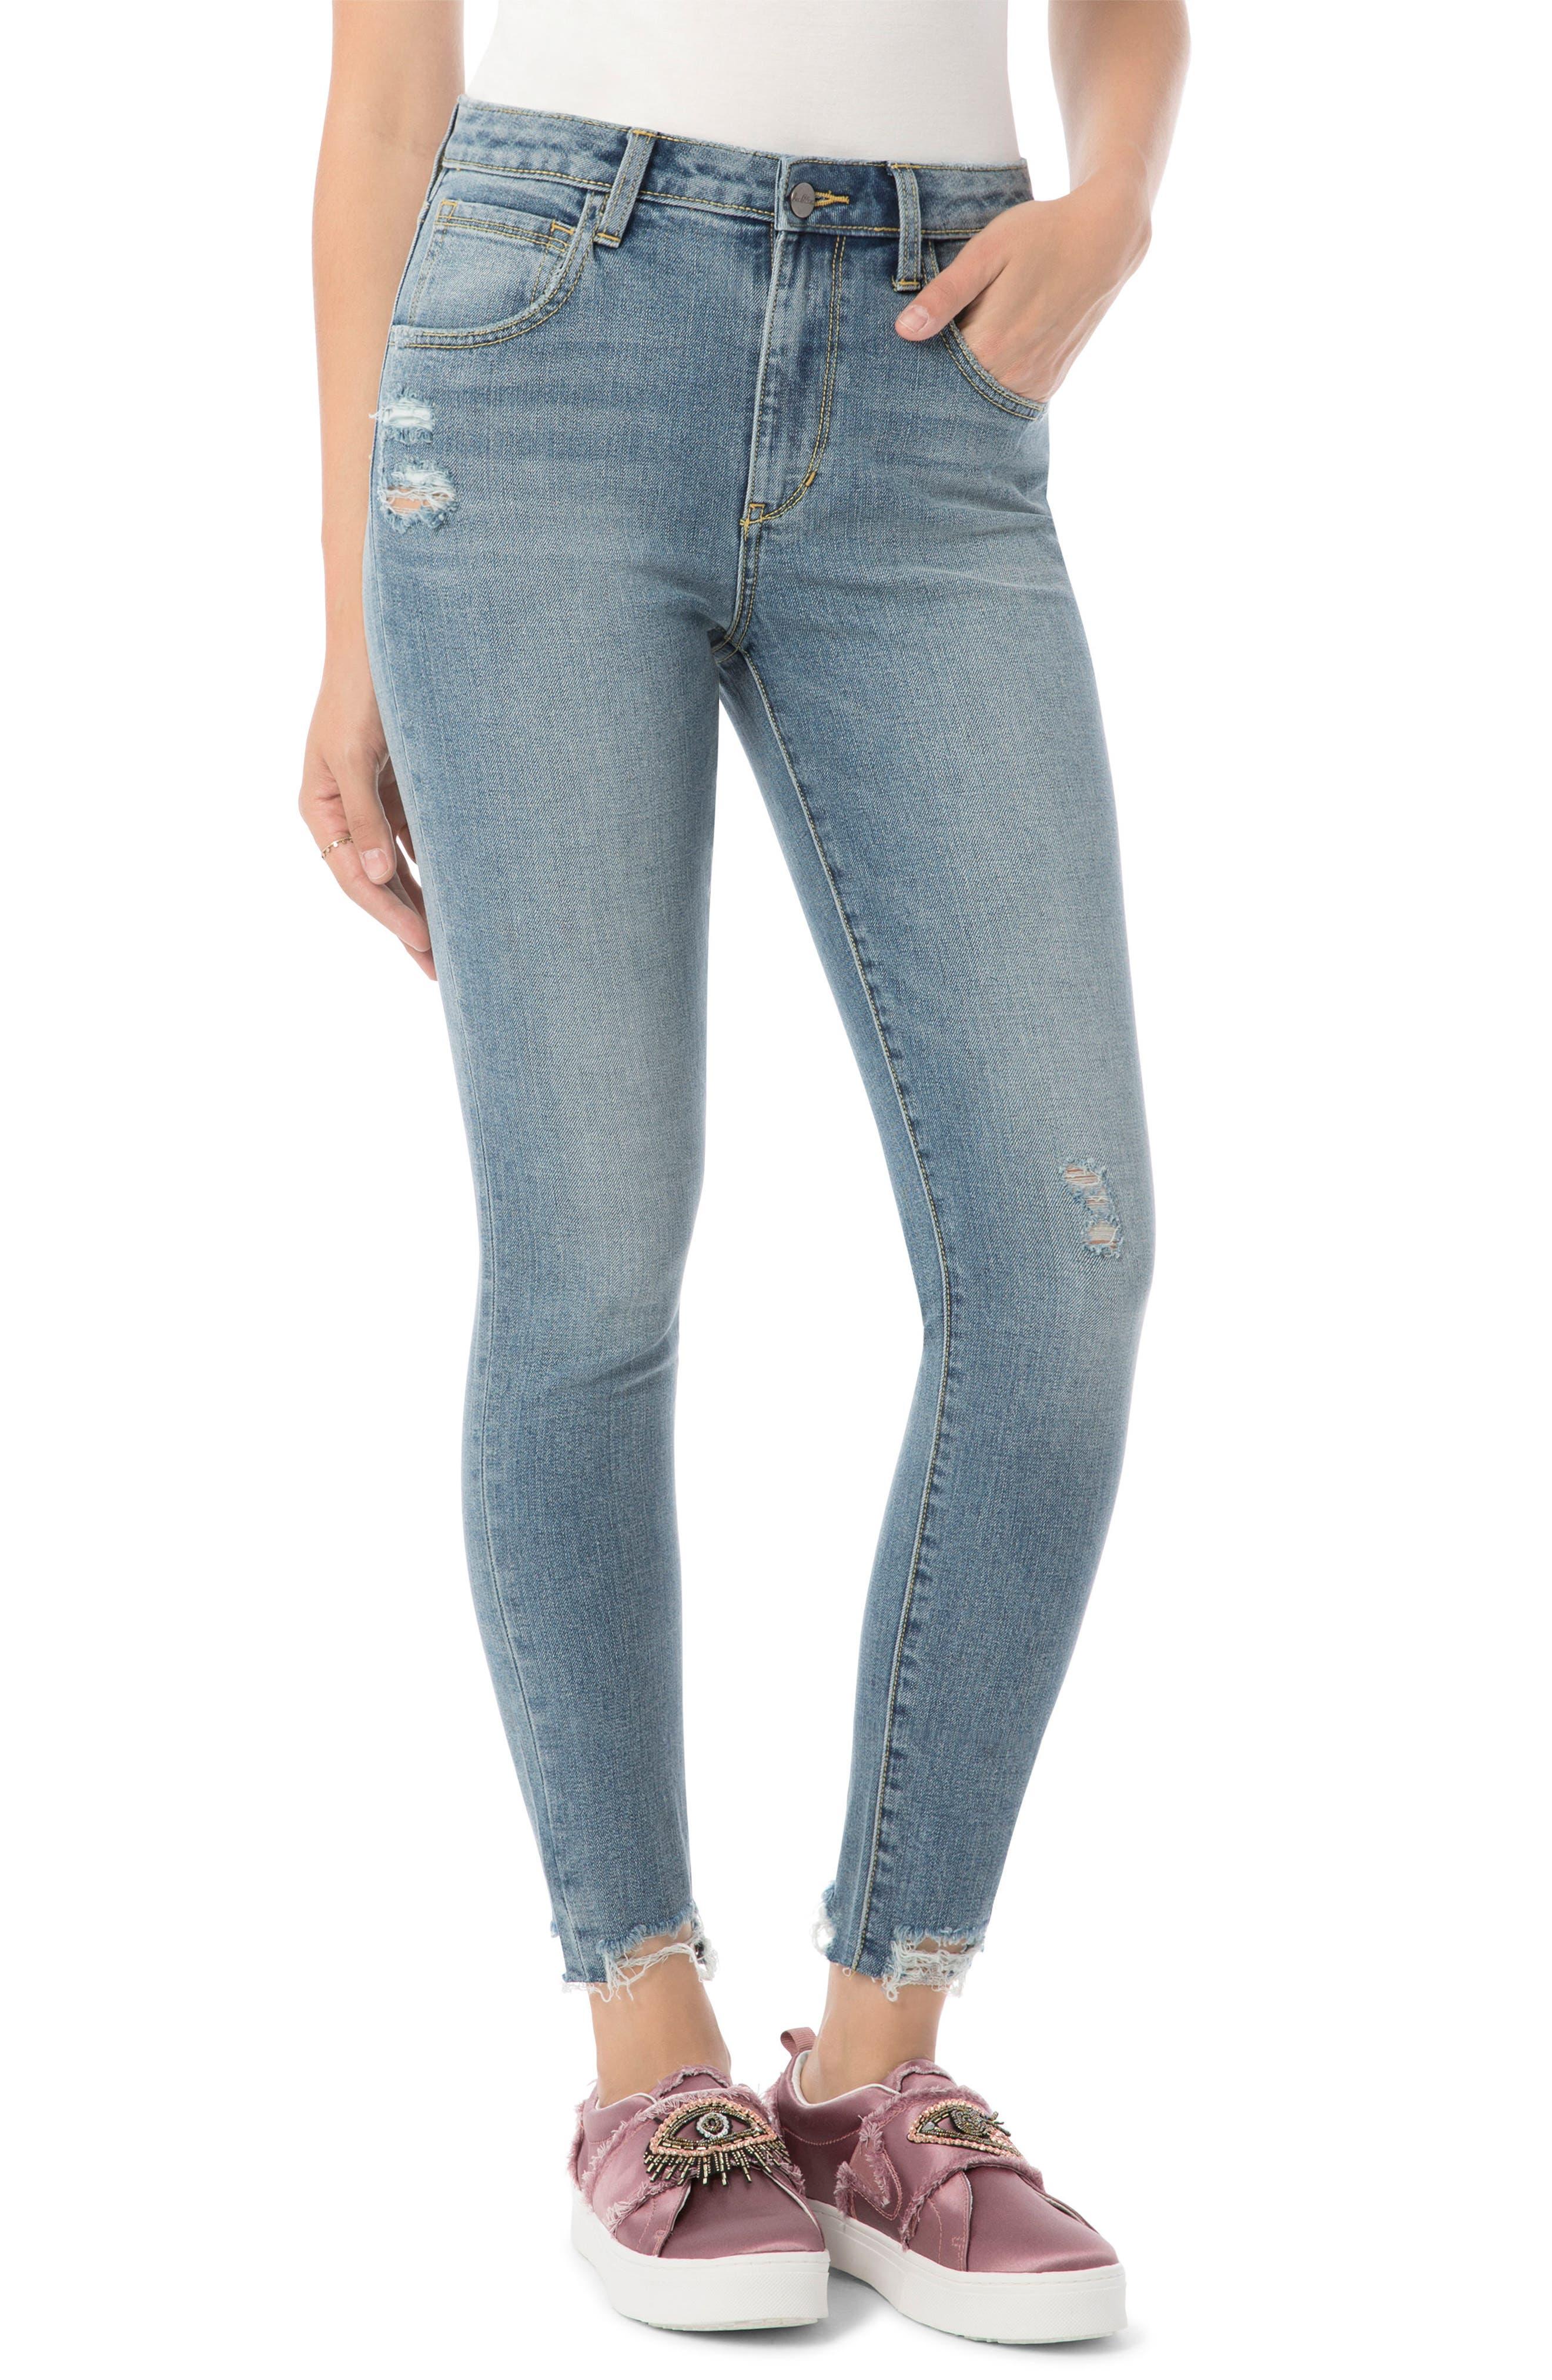 Main Image - Sam Edelman The Stilletto Skinny High-Waist Jeans (Ainsley)